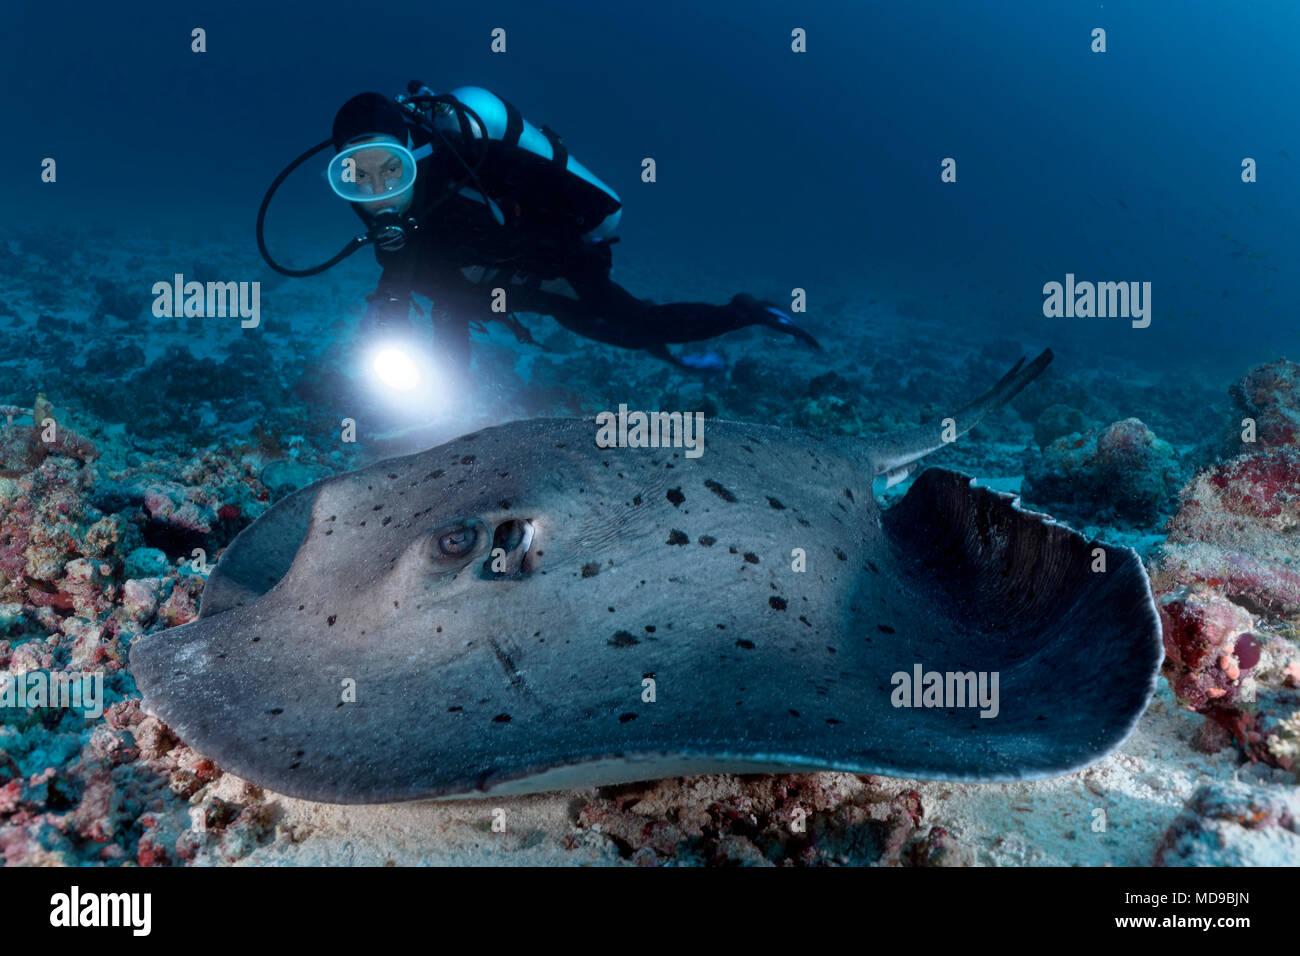 Buzo con lámpara viendo Taeniura meyeni Blackspotted stingray (Océano Índico), Maldivas Imagen De Stock